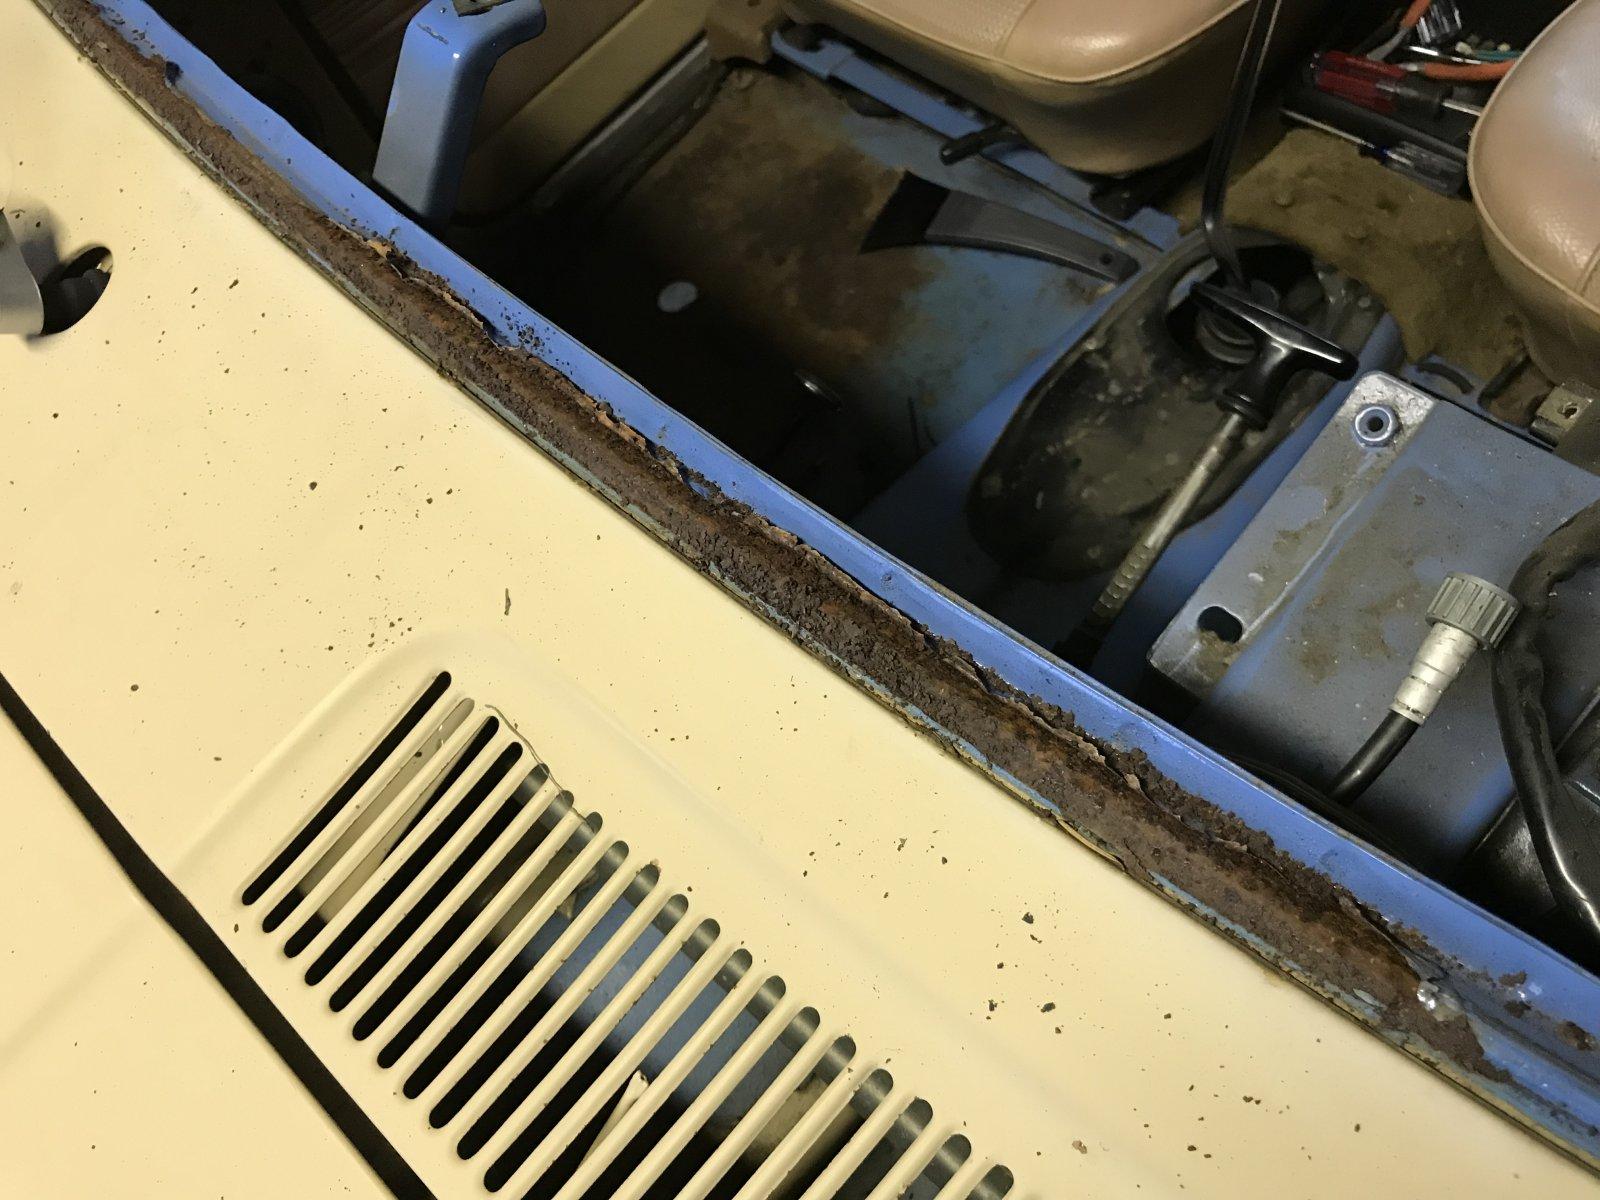 12282017 bruiser windshield and dash (3).JPG